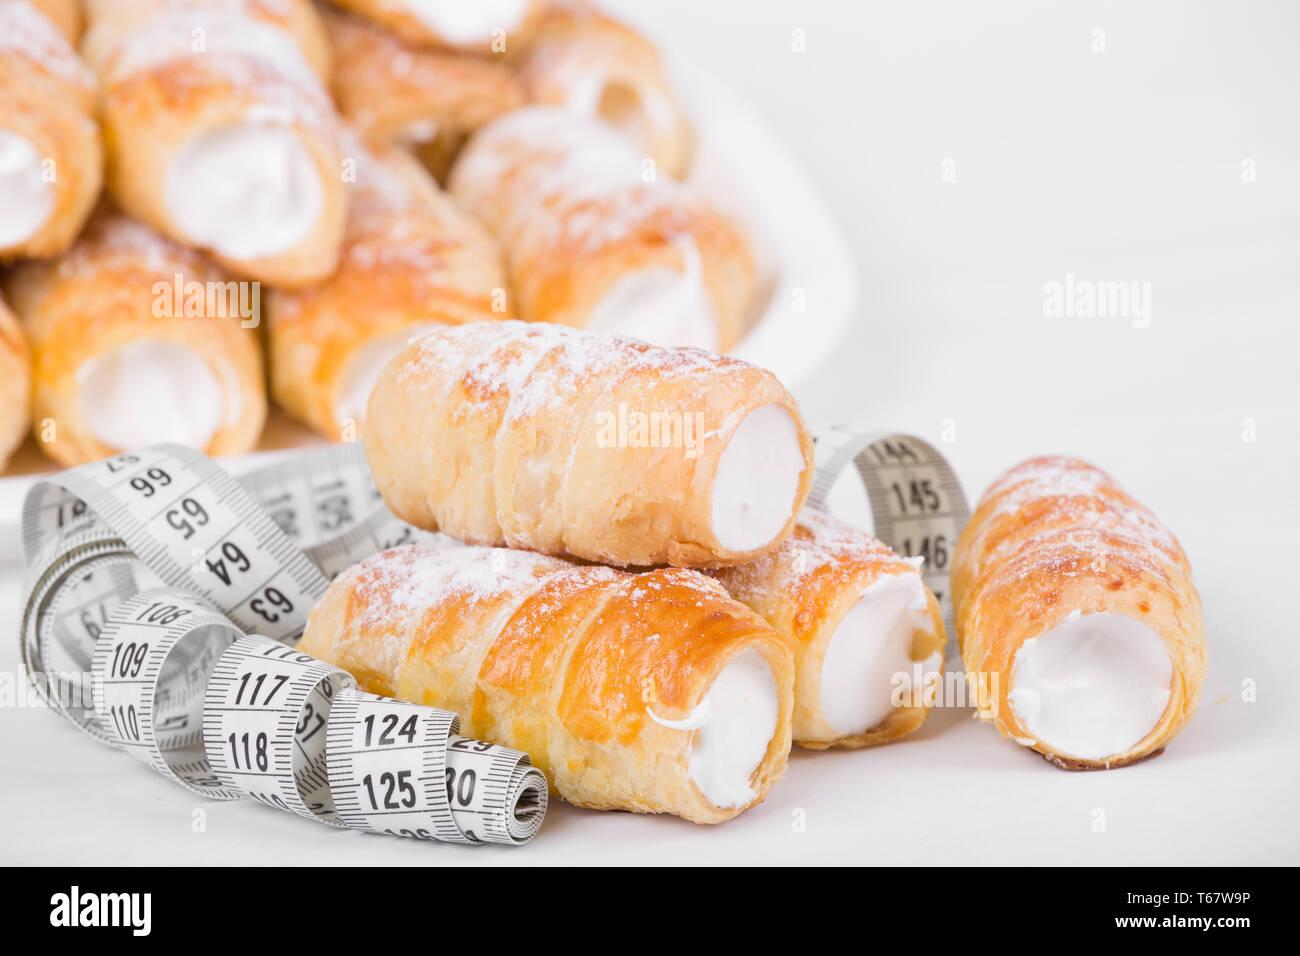 Concepto de adelgazamiento, pasteles con cinta métrica Foto de stock